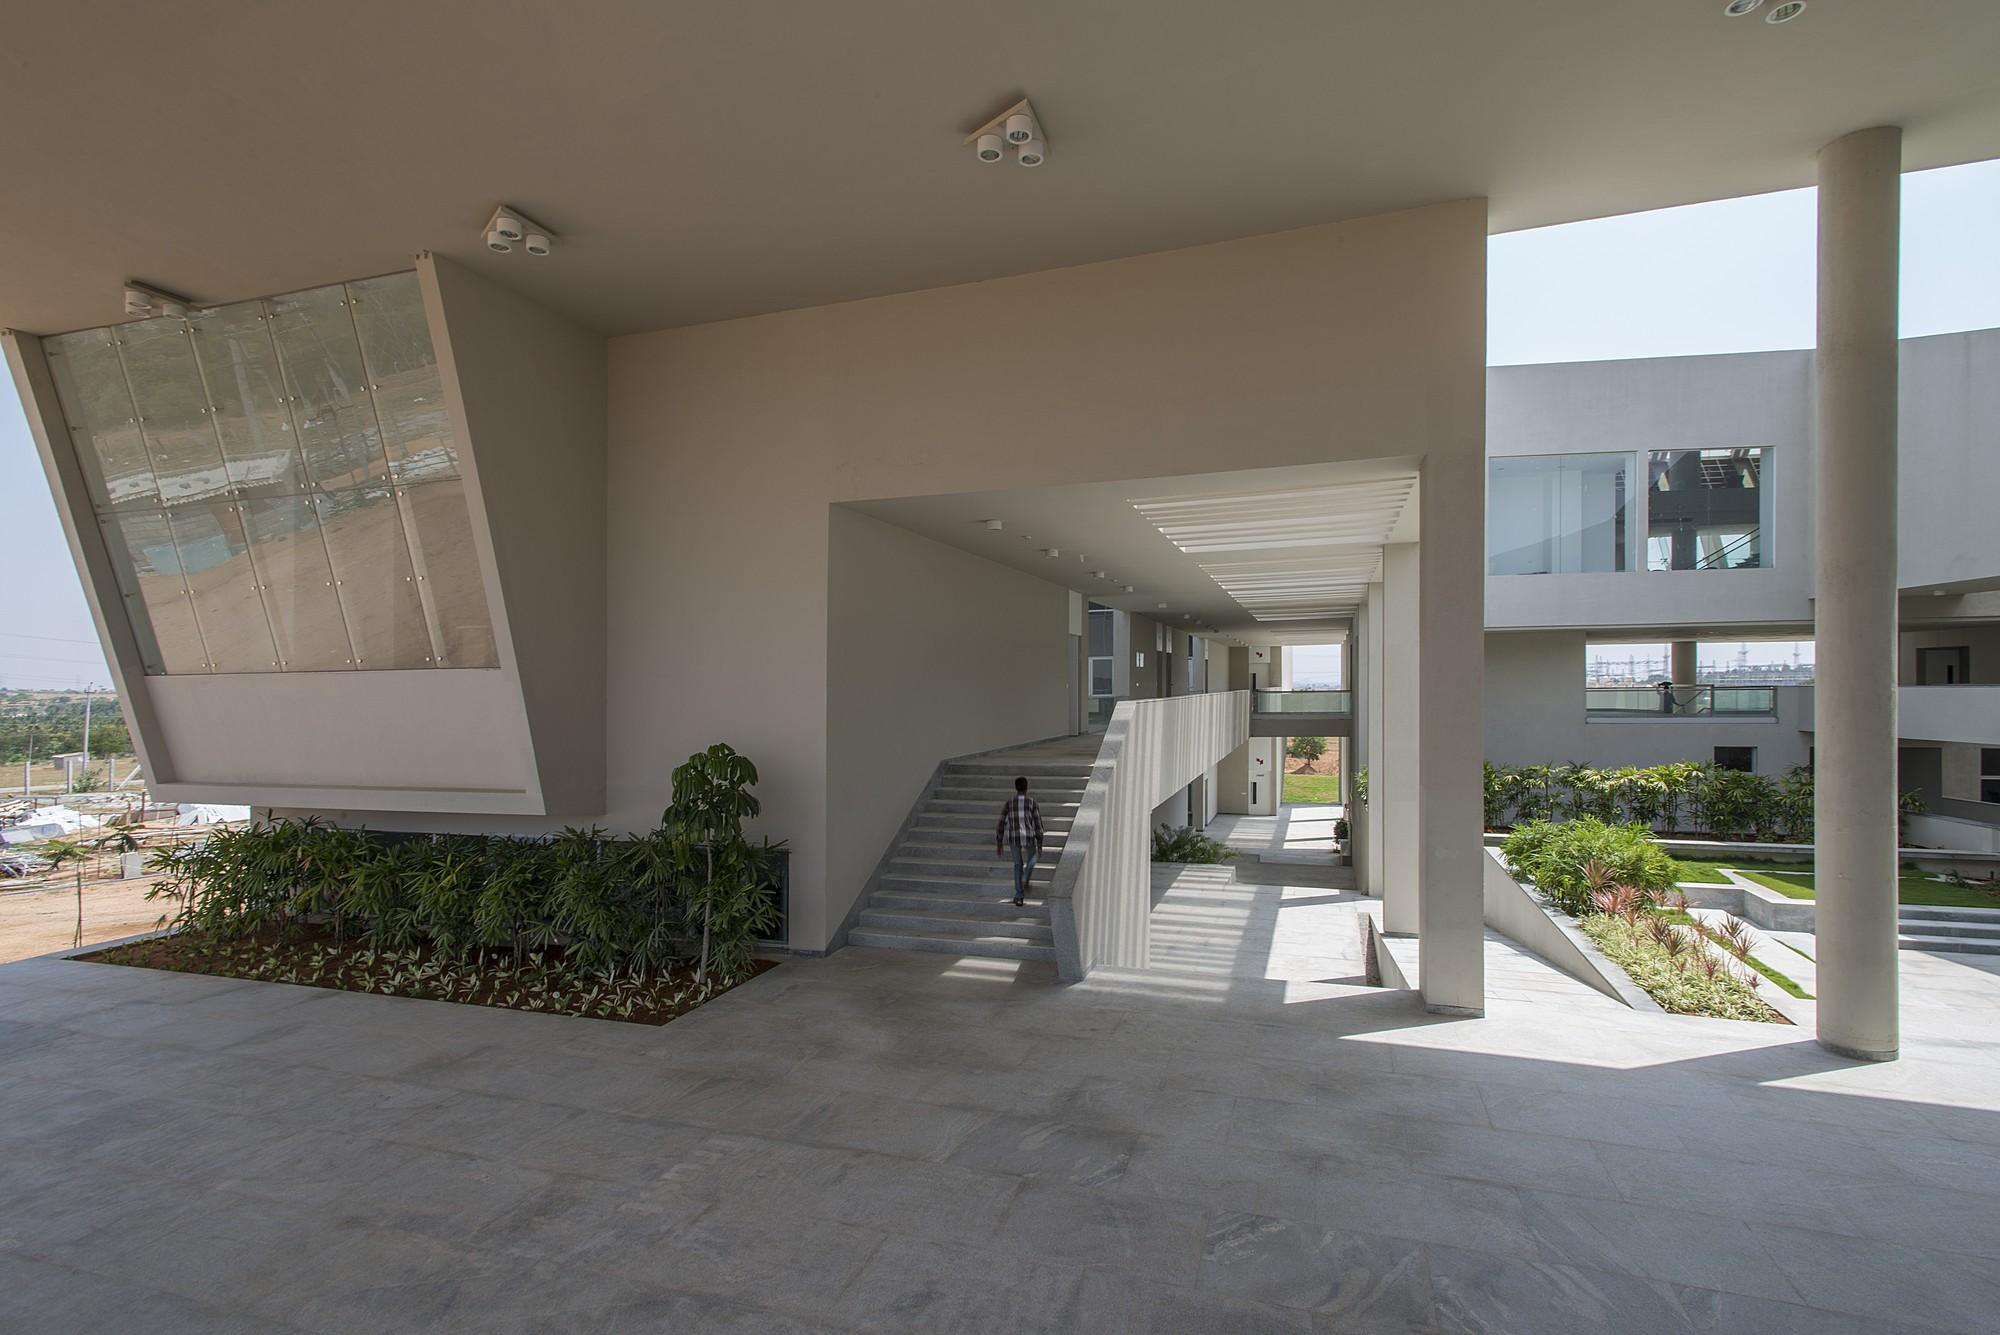 Myra – School Of Business / Architecture Paradigm